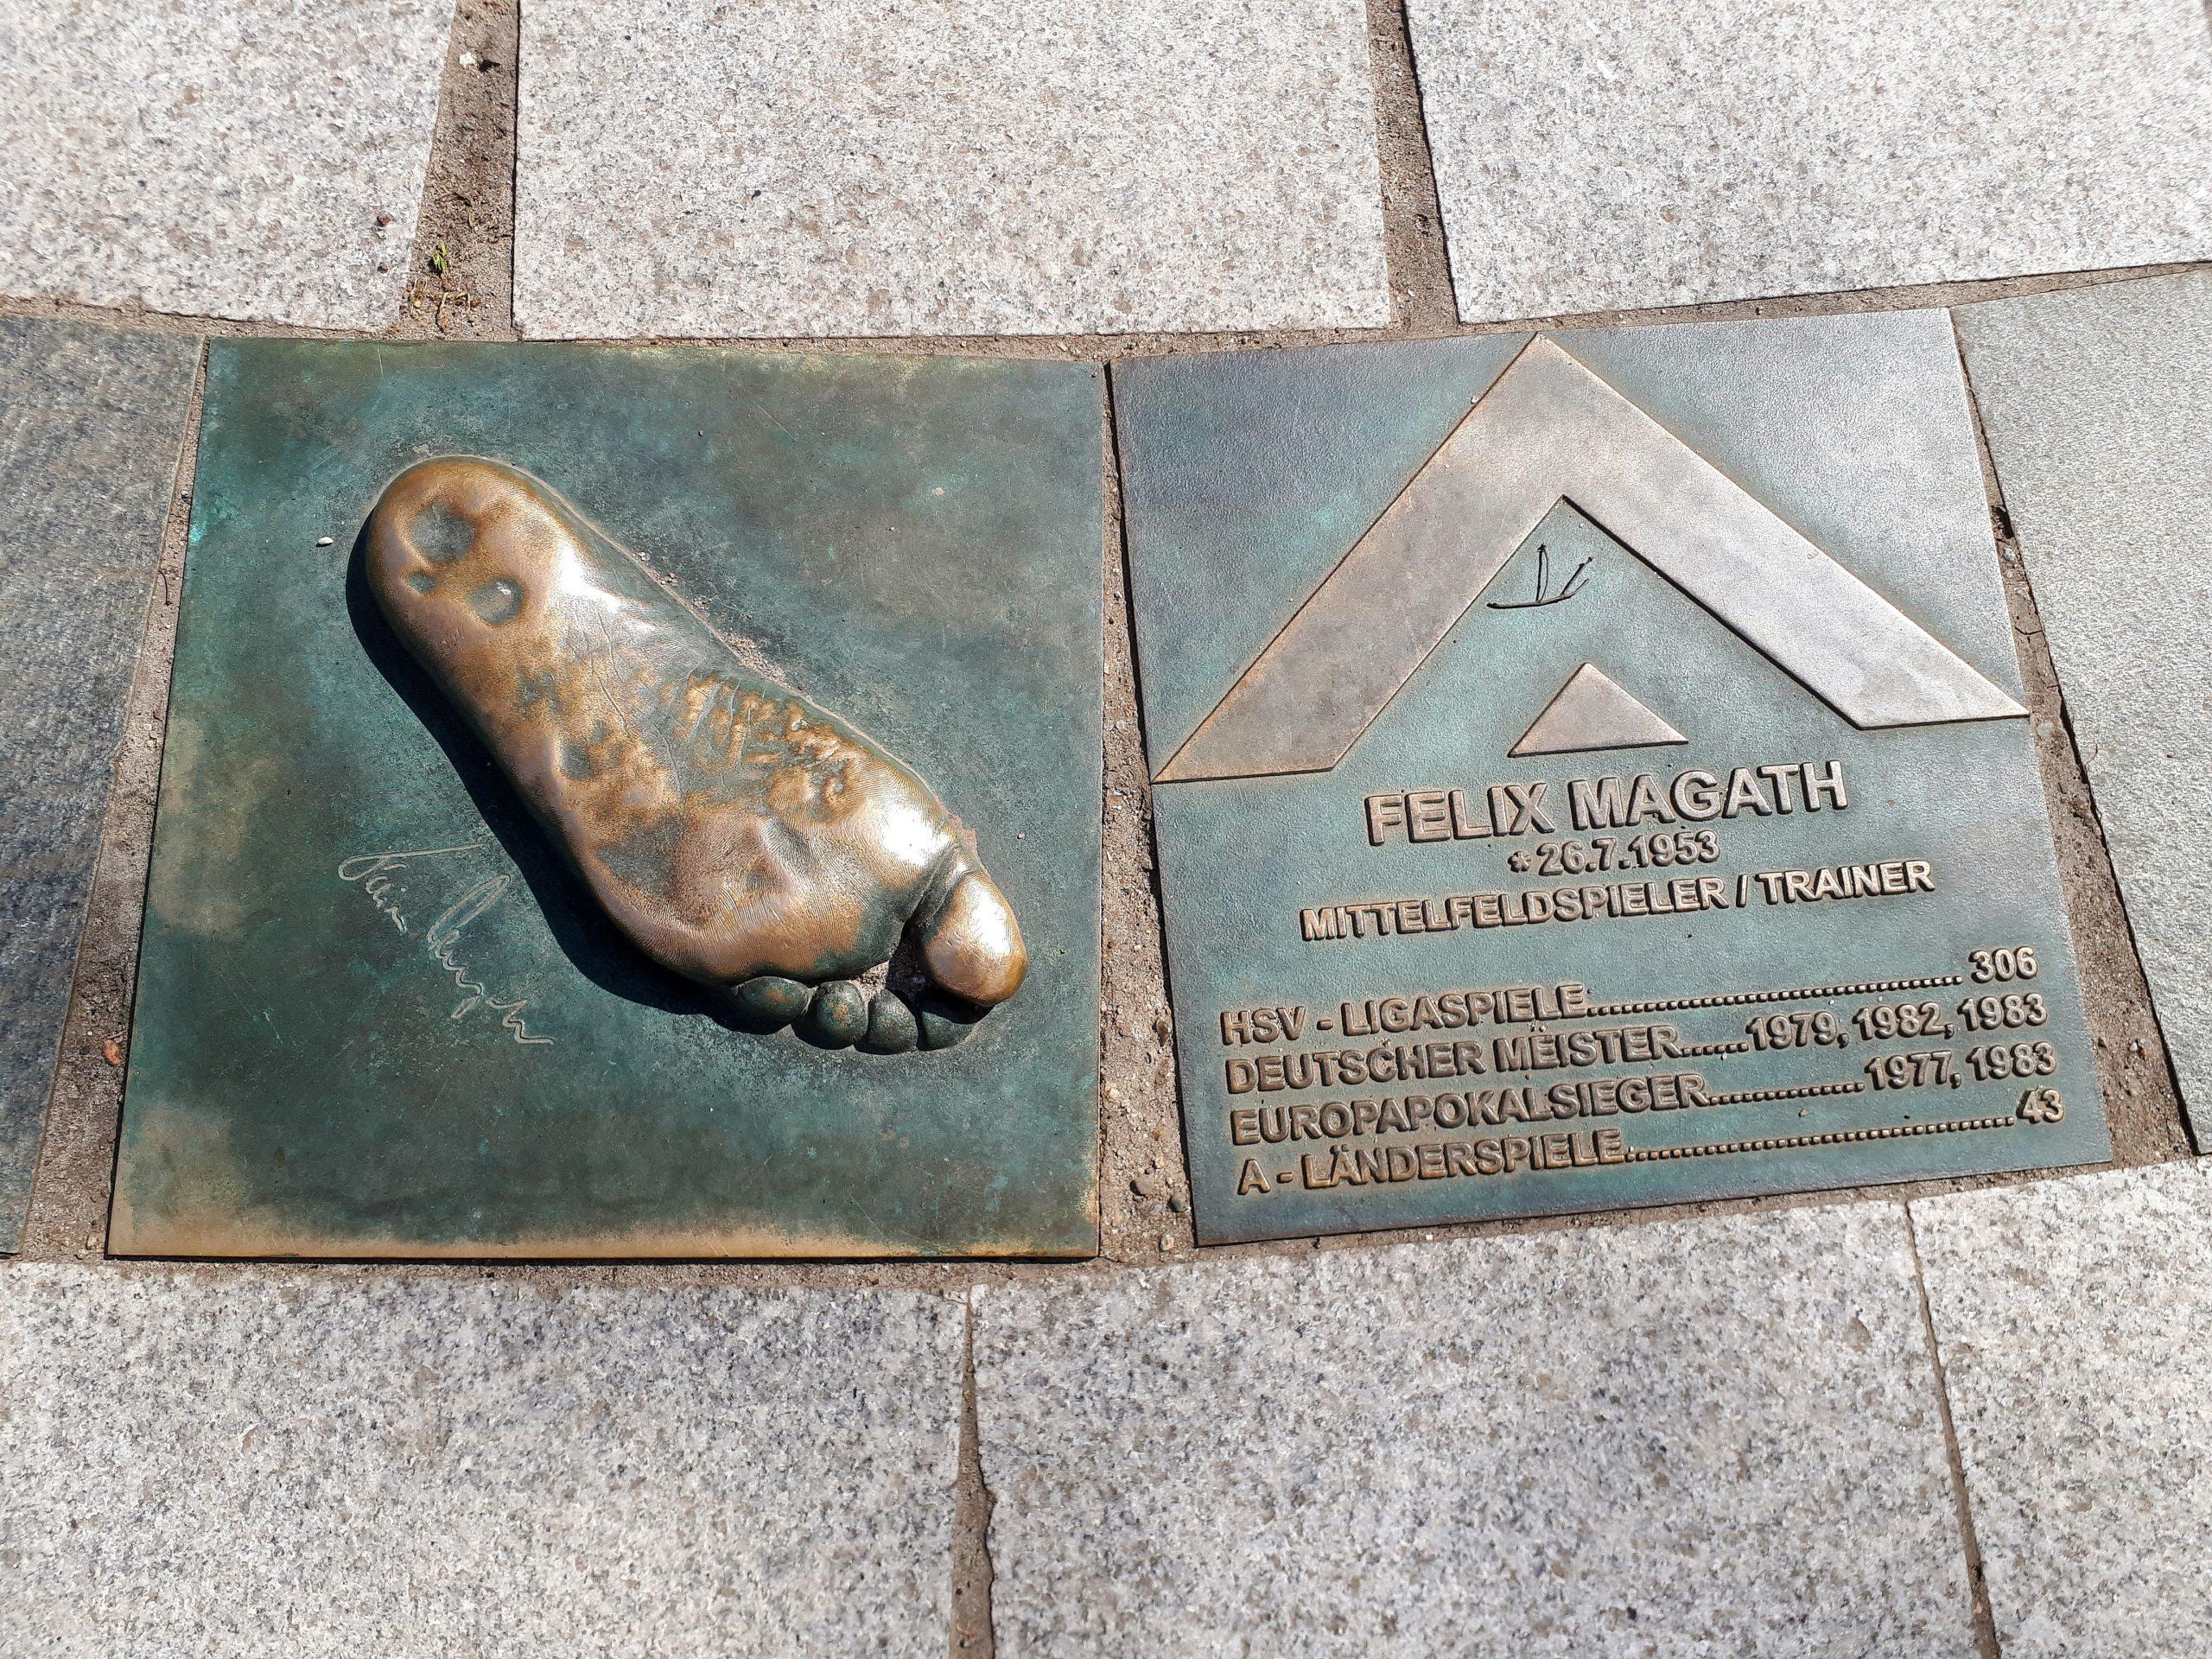 Der Walk of Fame: Felix Magath